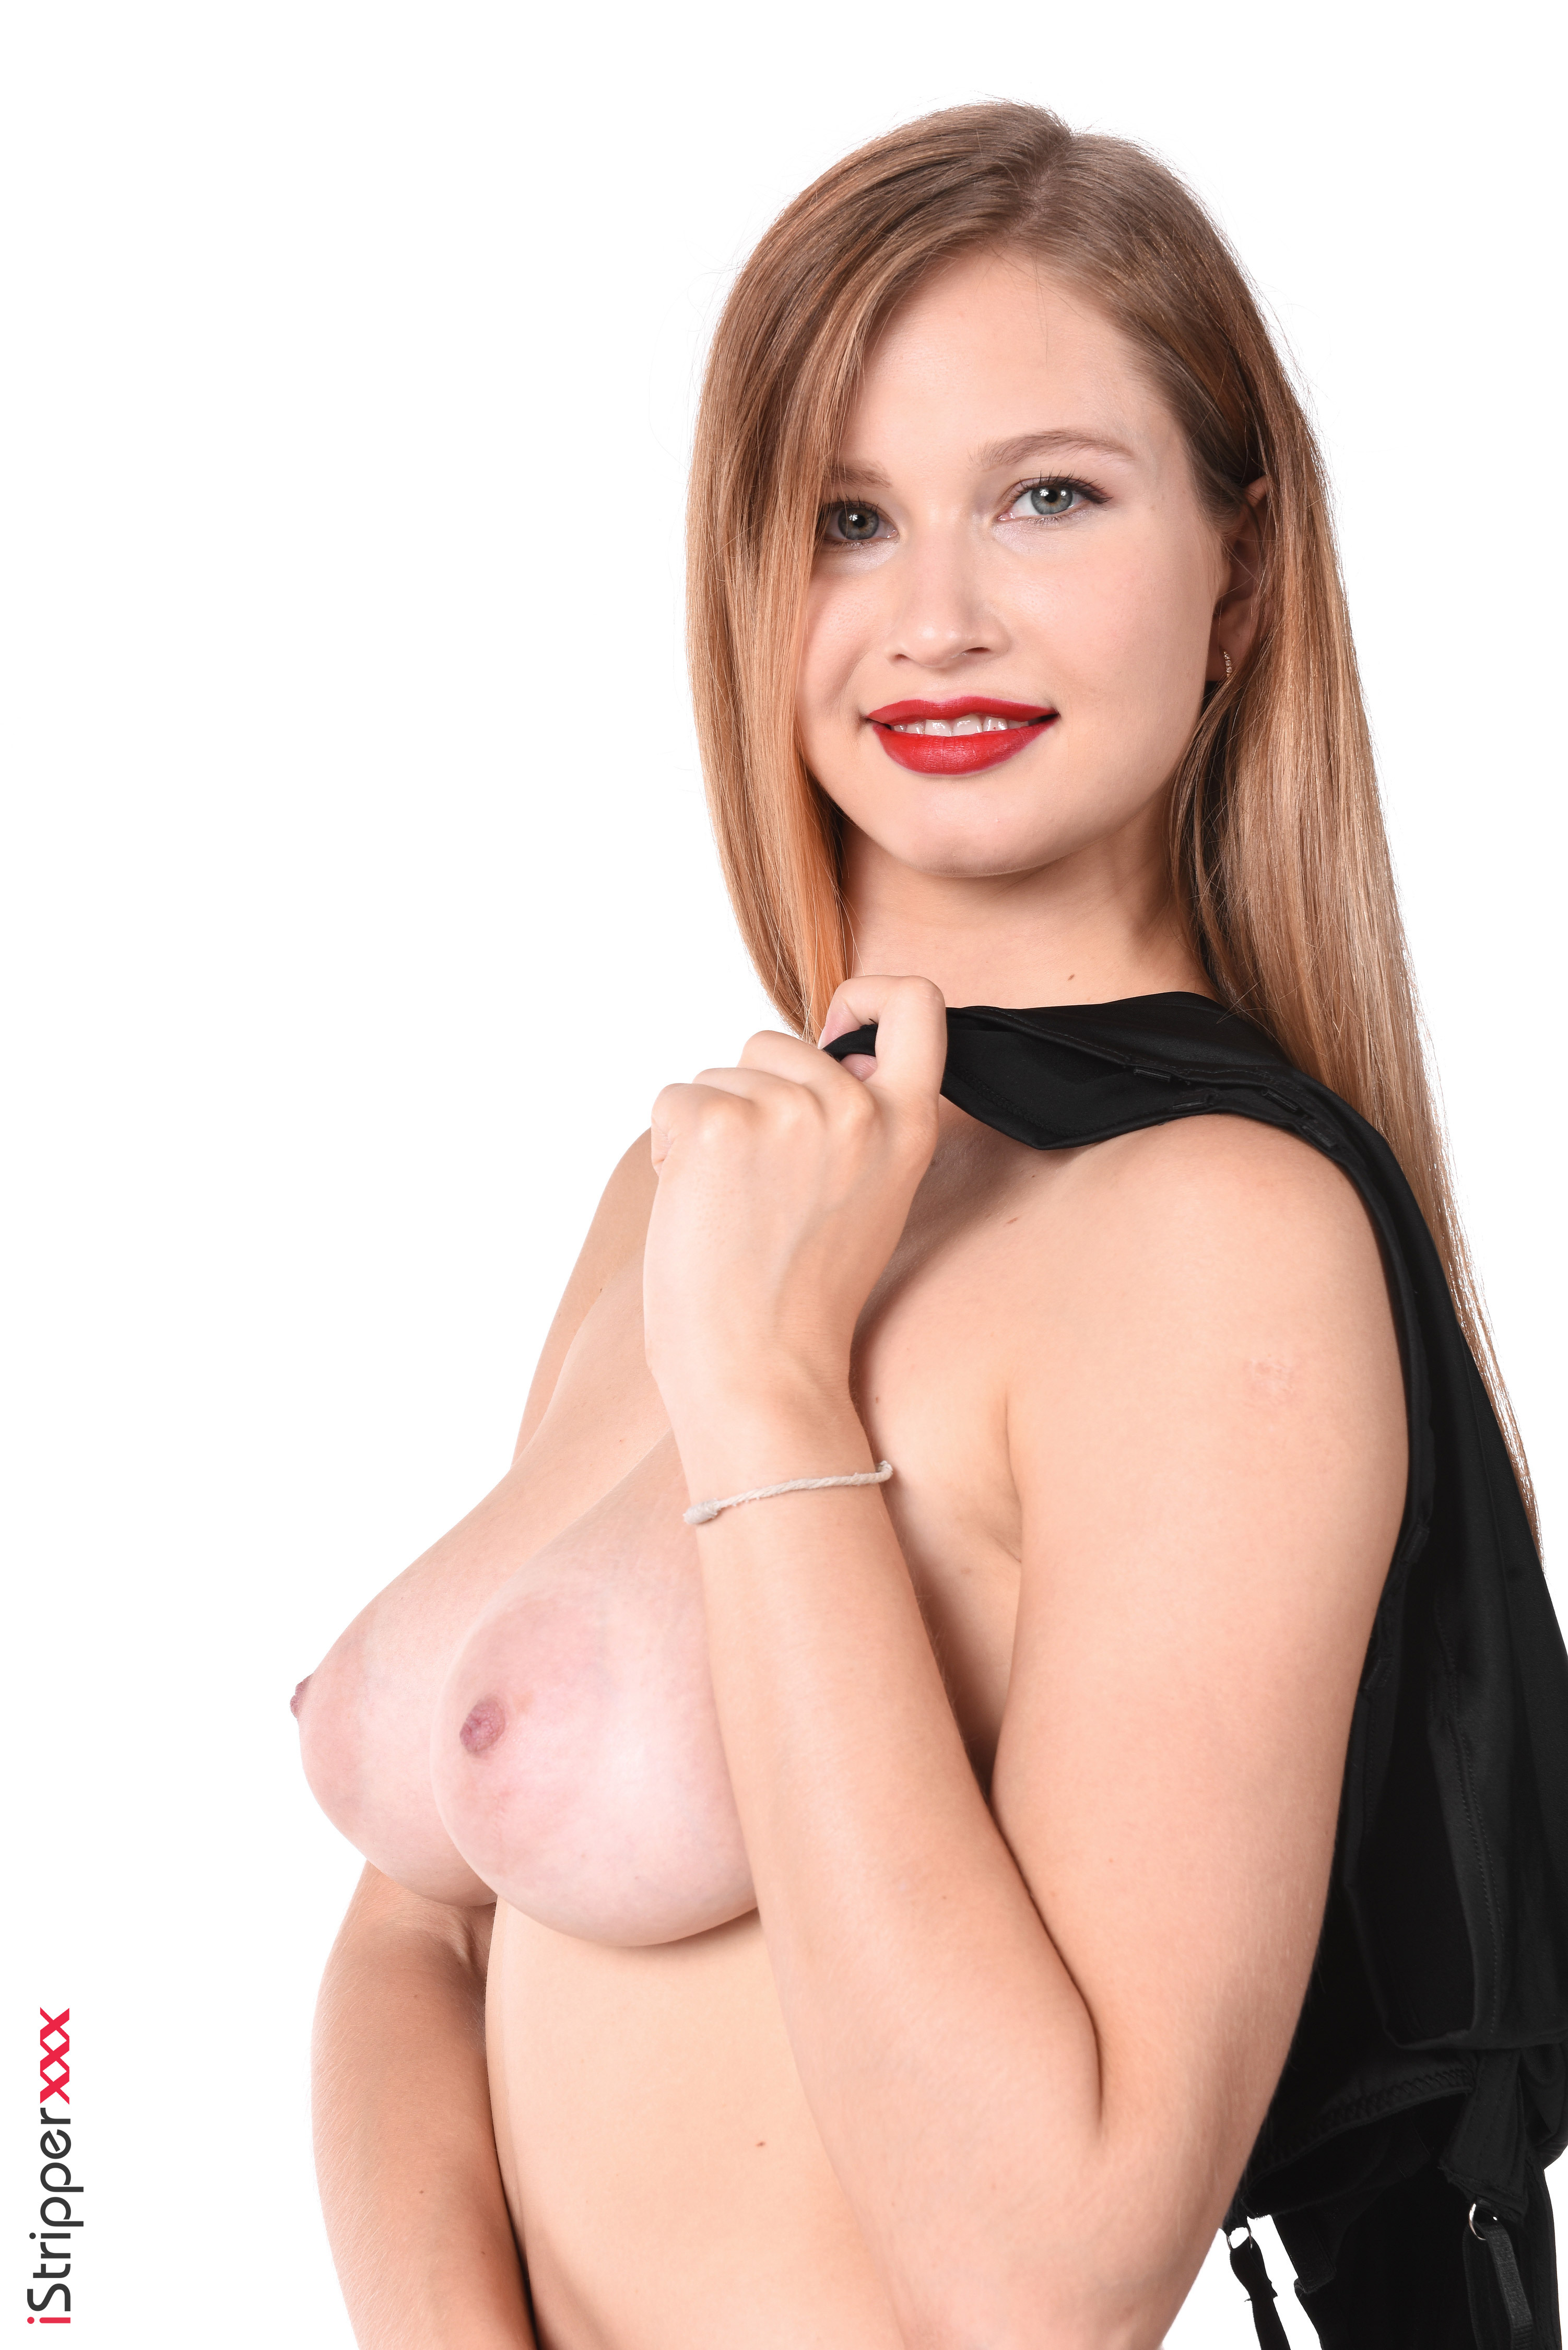 erotic babes naked